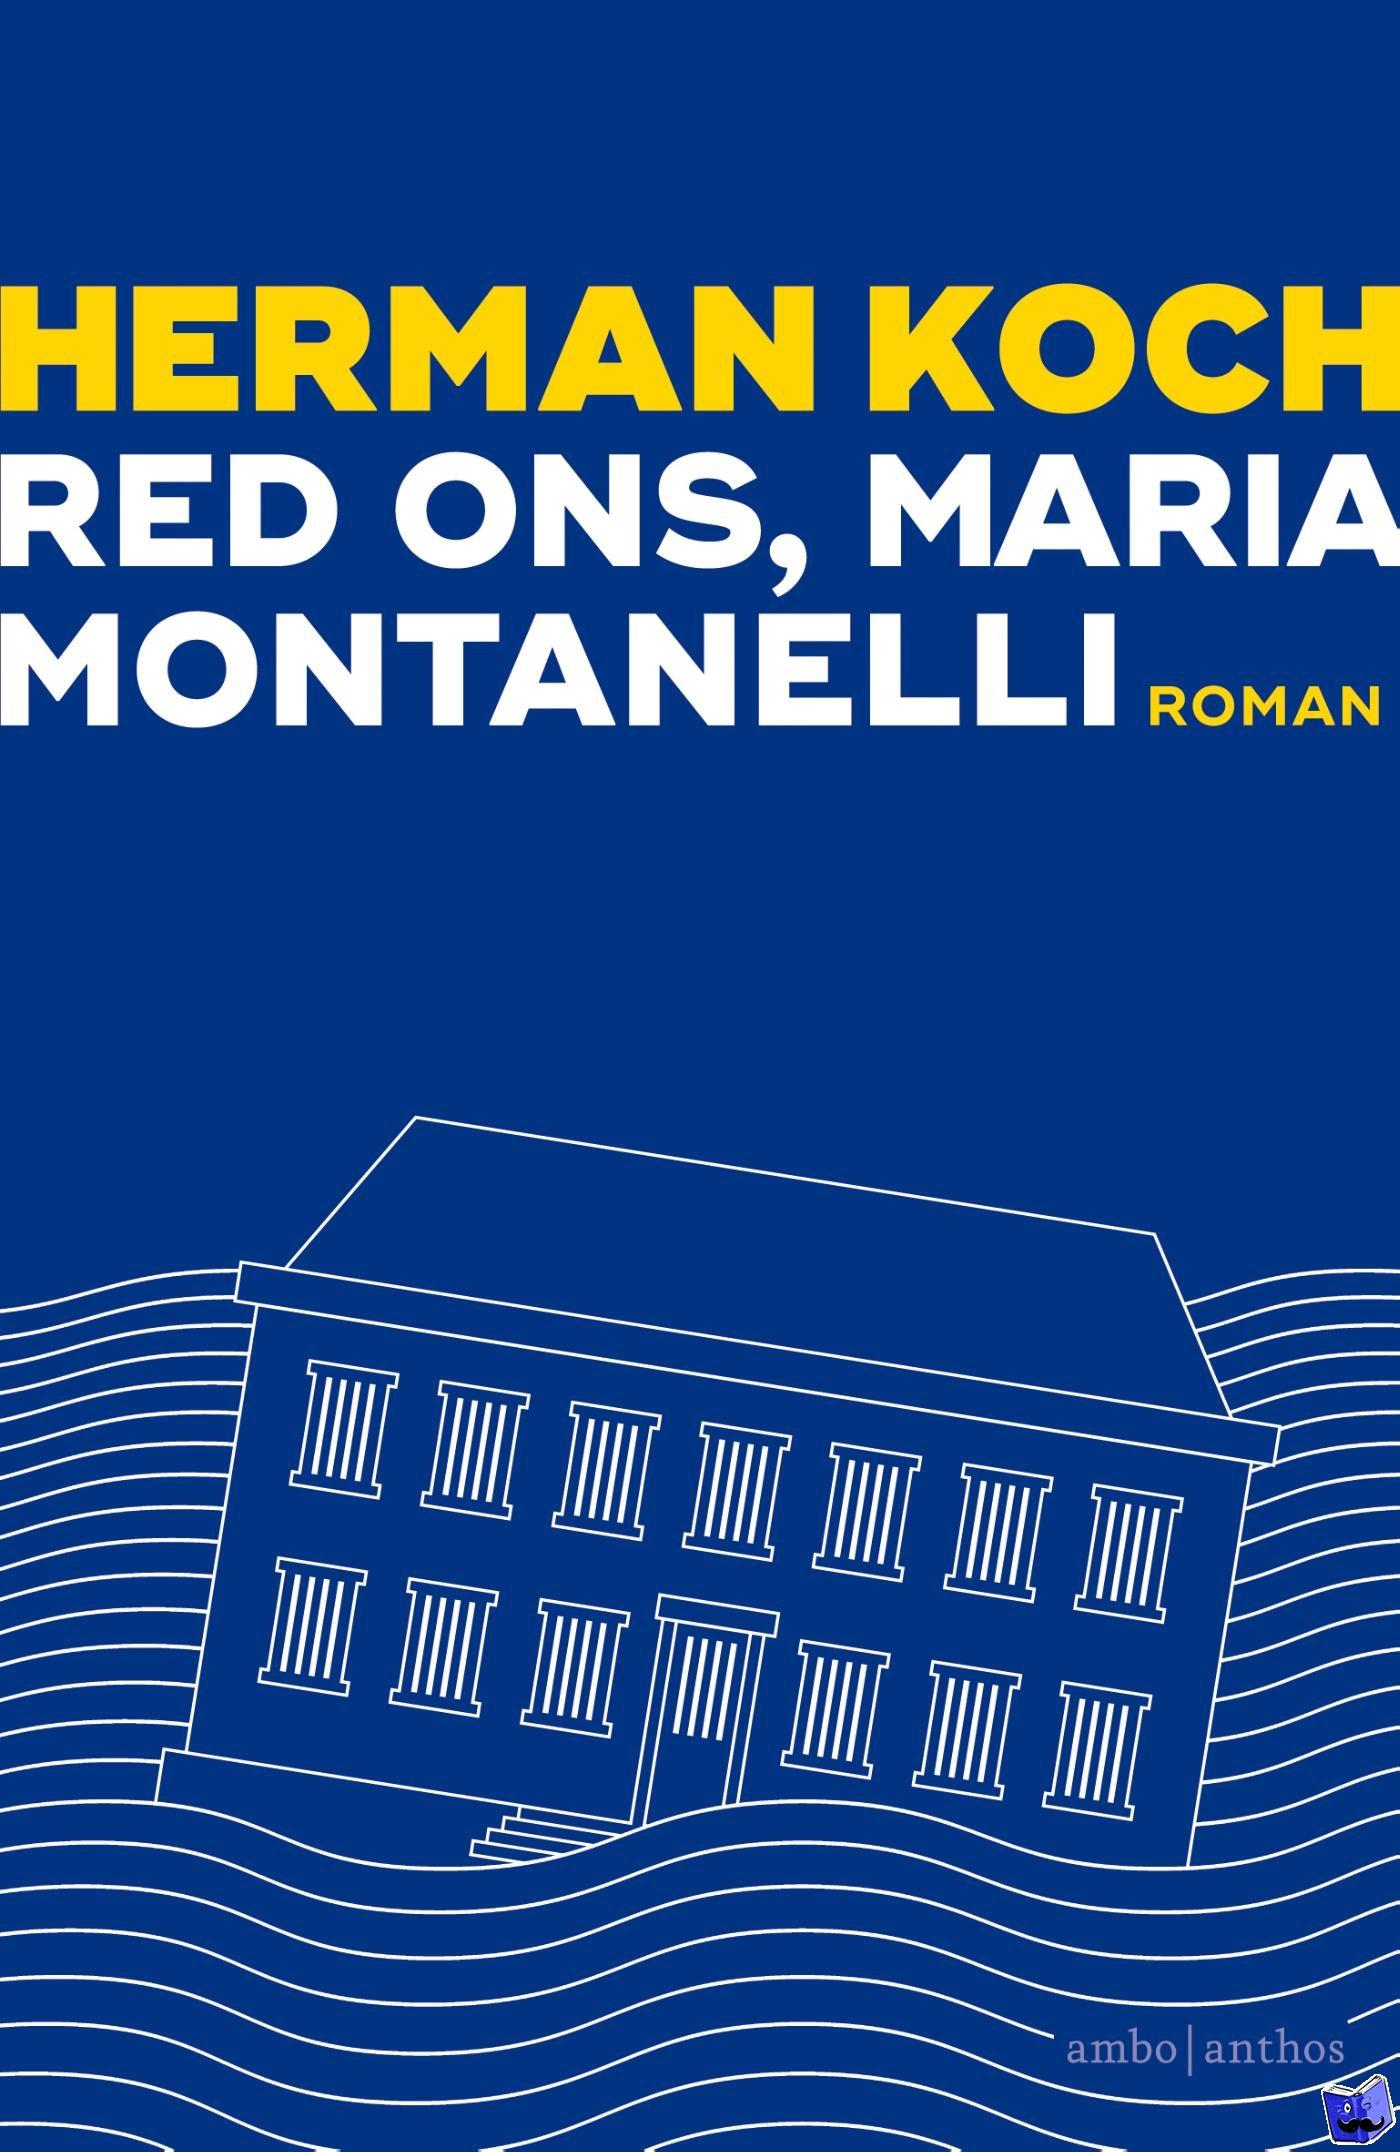 Koch, Herman - Red ons, Maria Montanelli